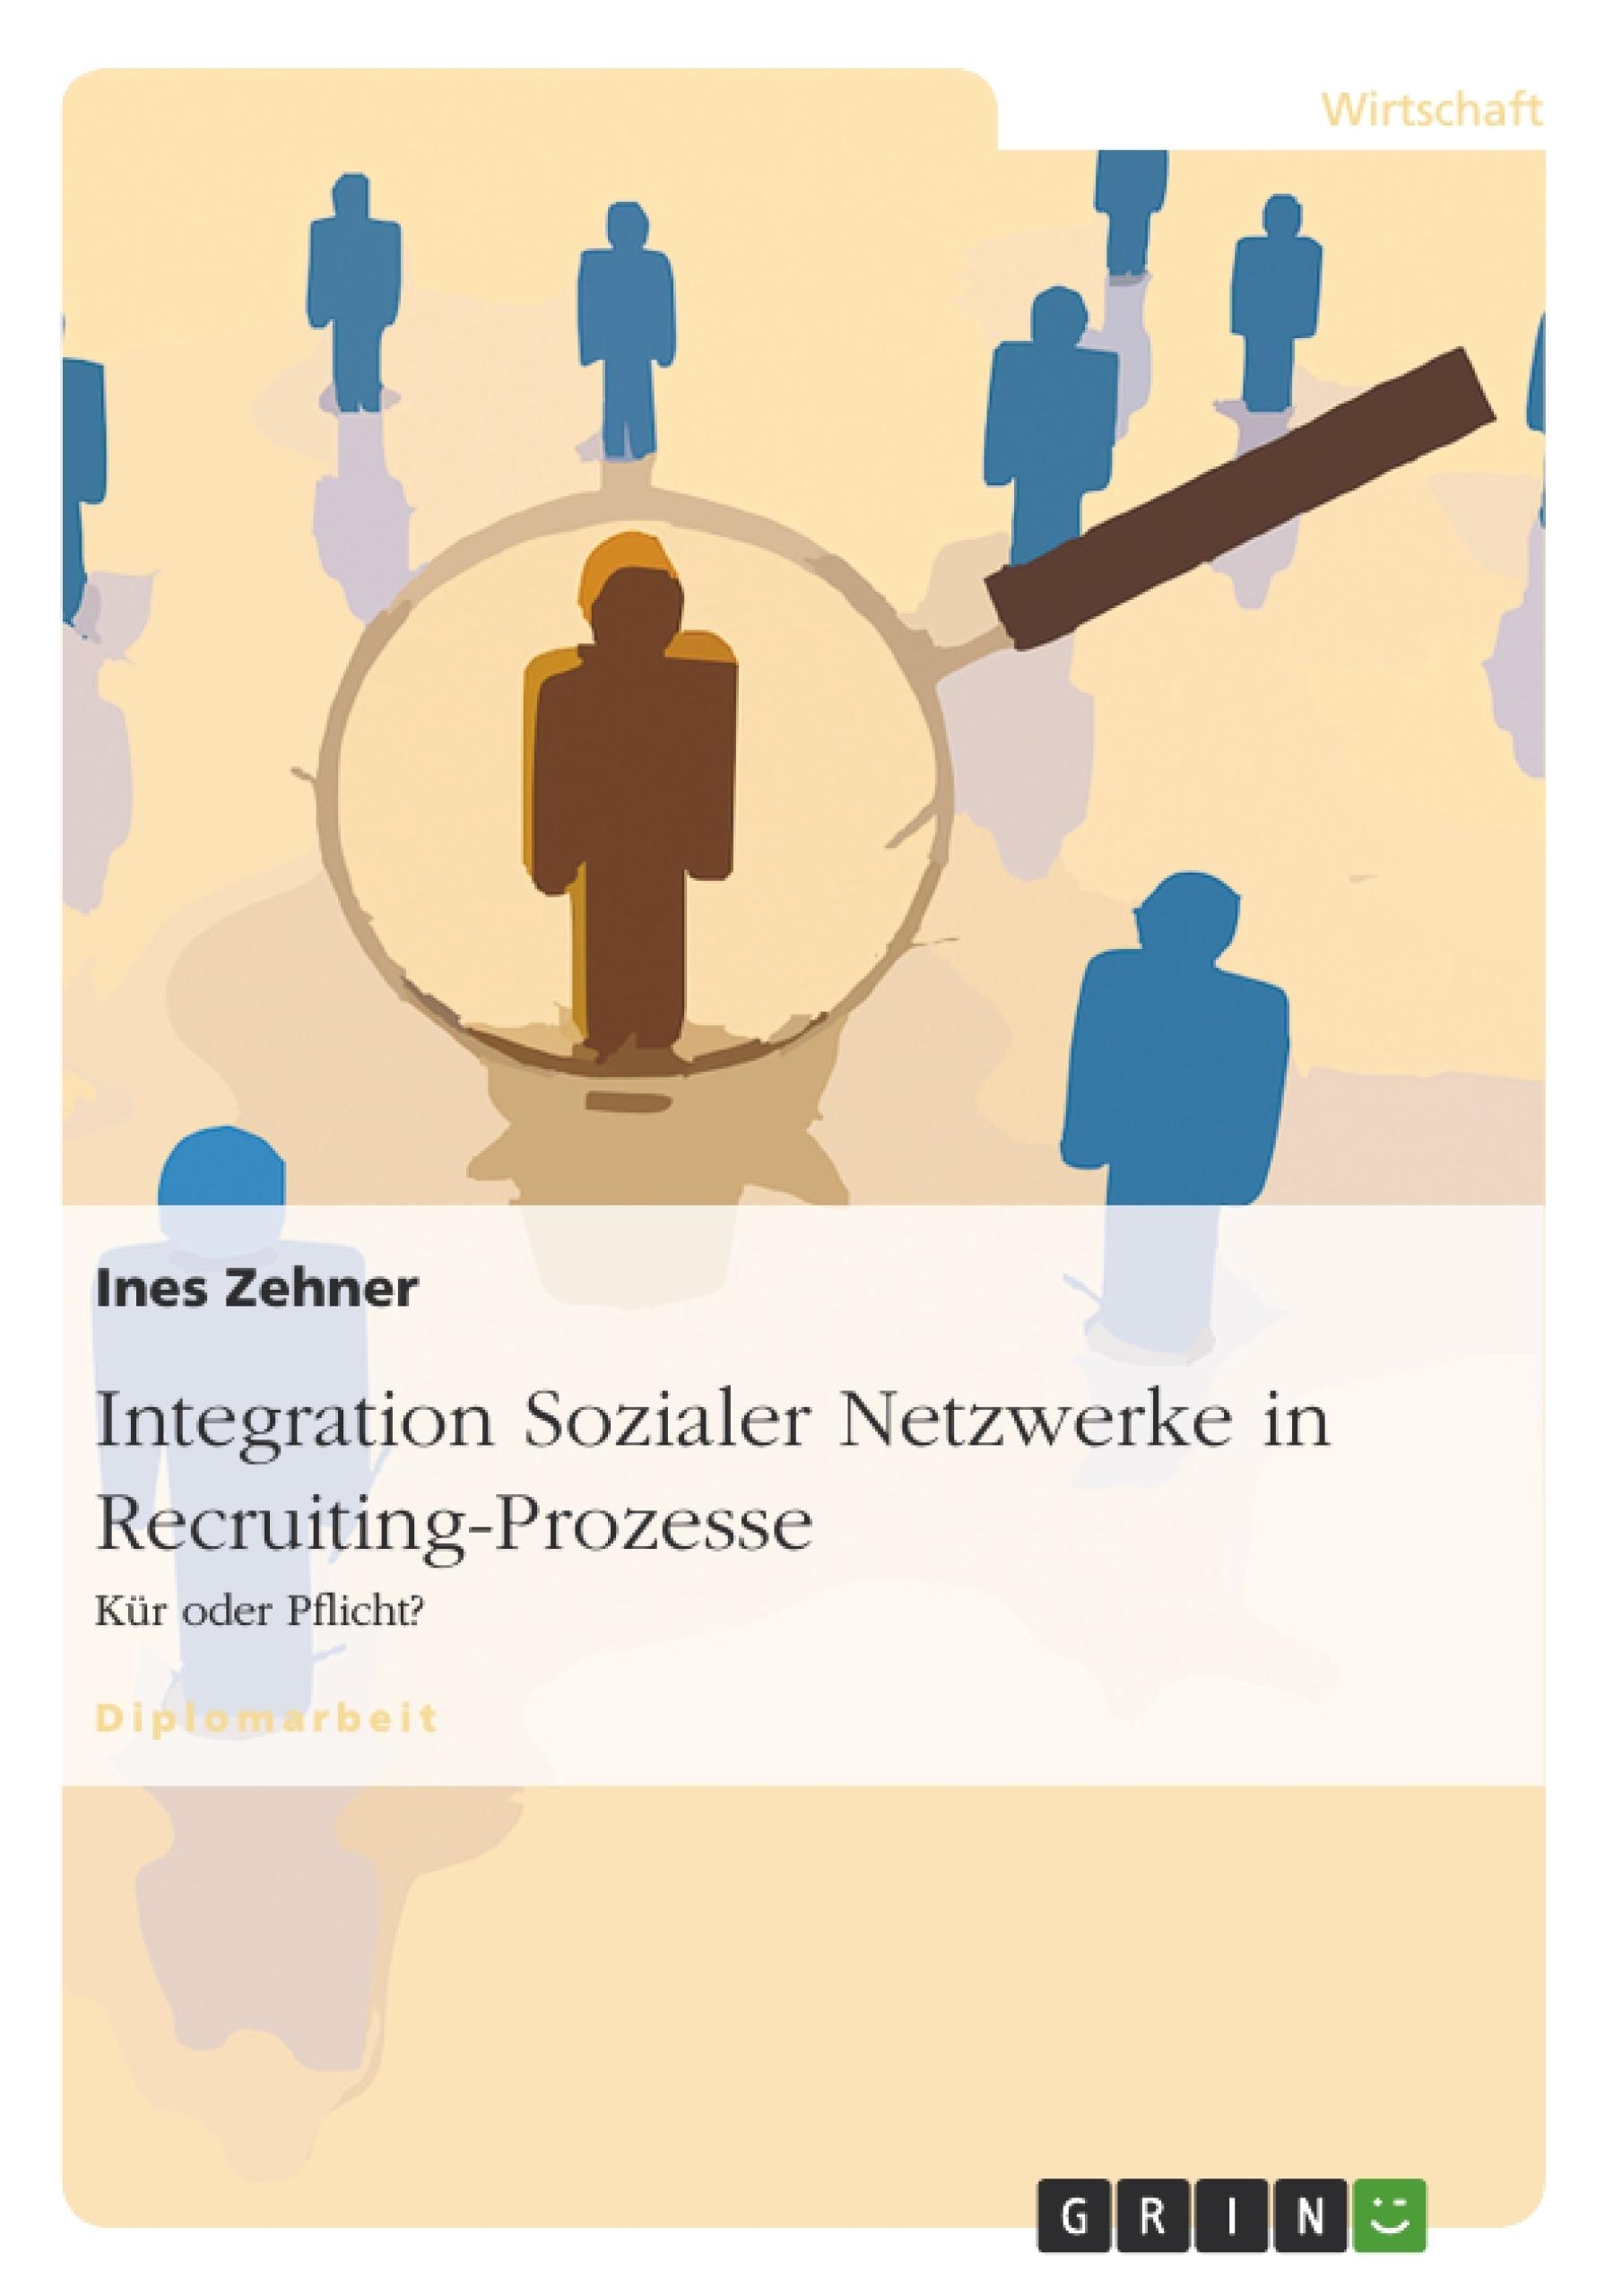 Titel: Integration Sozialer Netzwerke in Recruiting-Prozesse